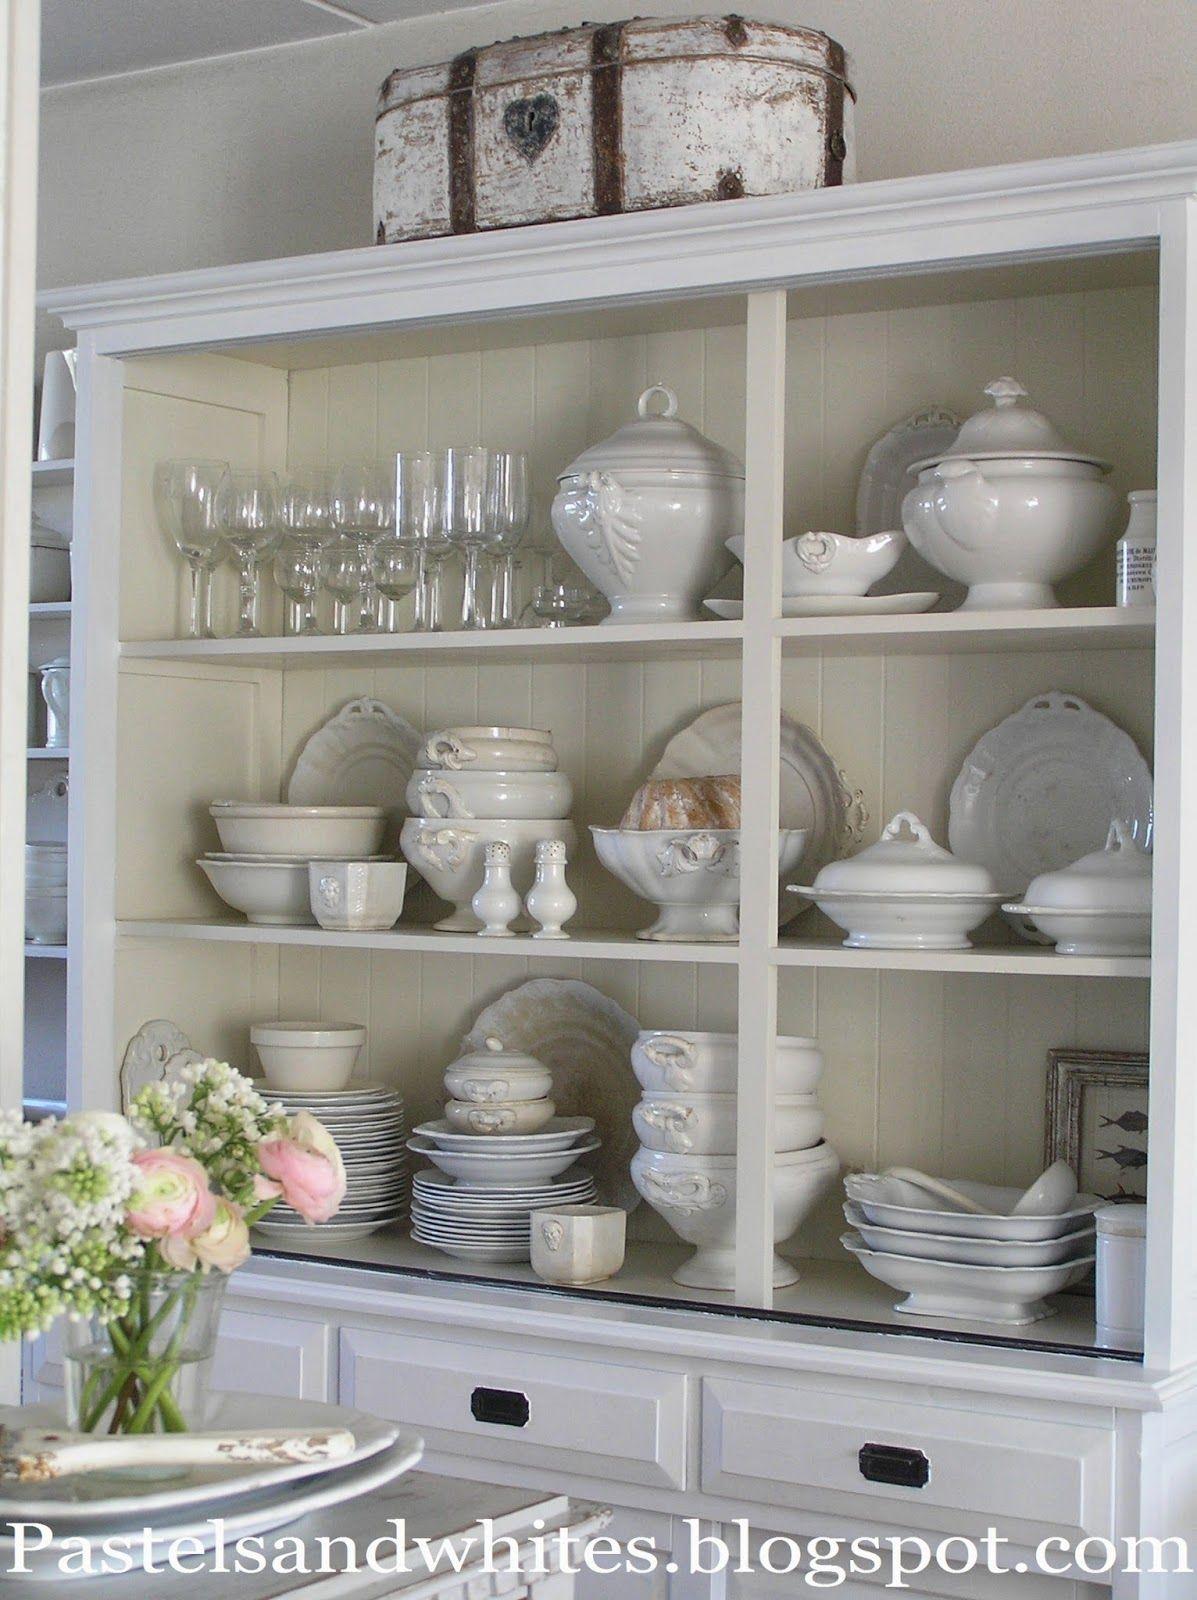 http://pastelsandwhites.blogspot.com/ - beautiful dresser with loads of white crockery